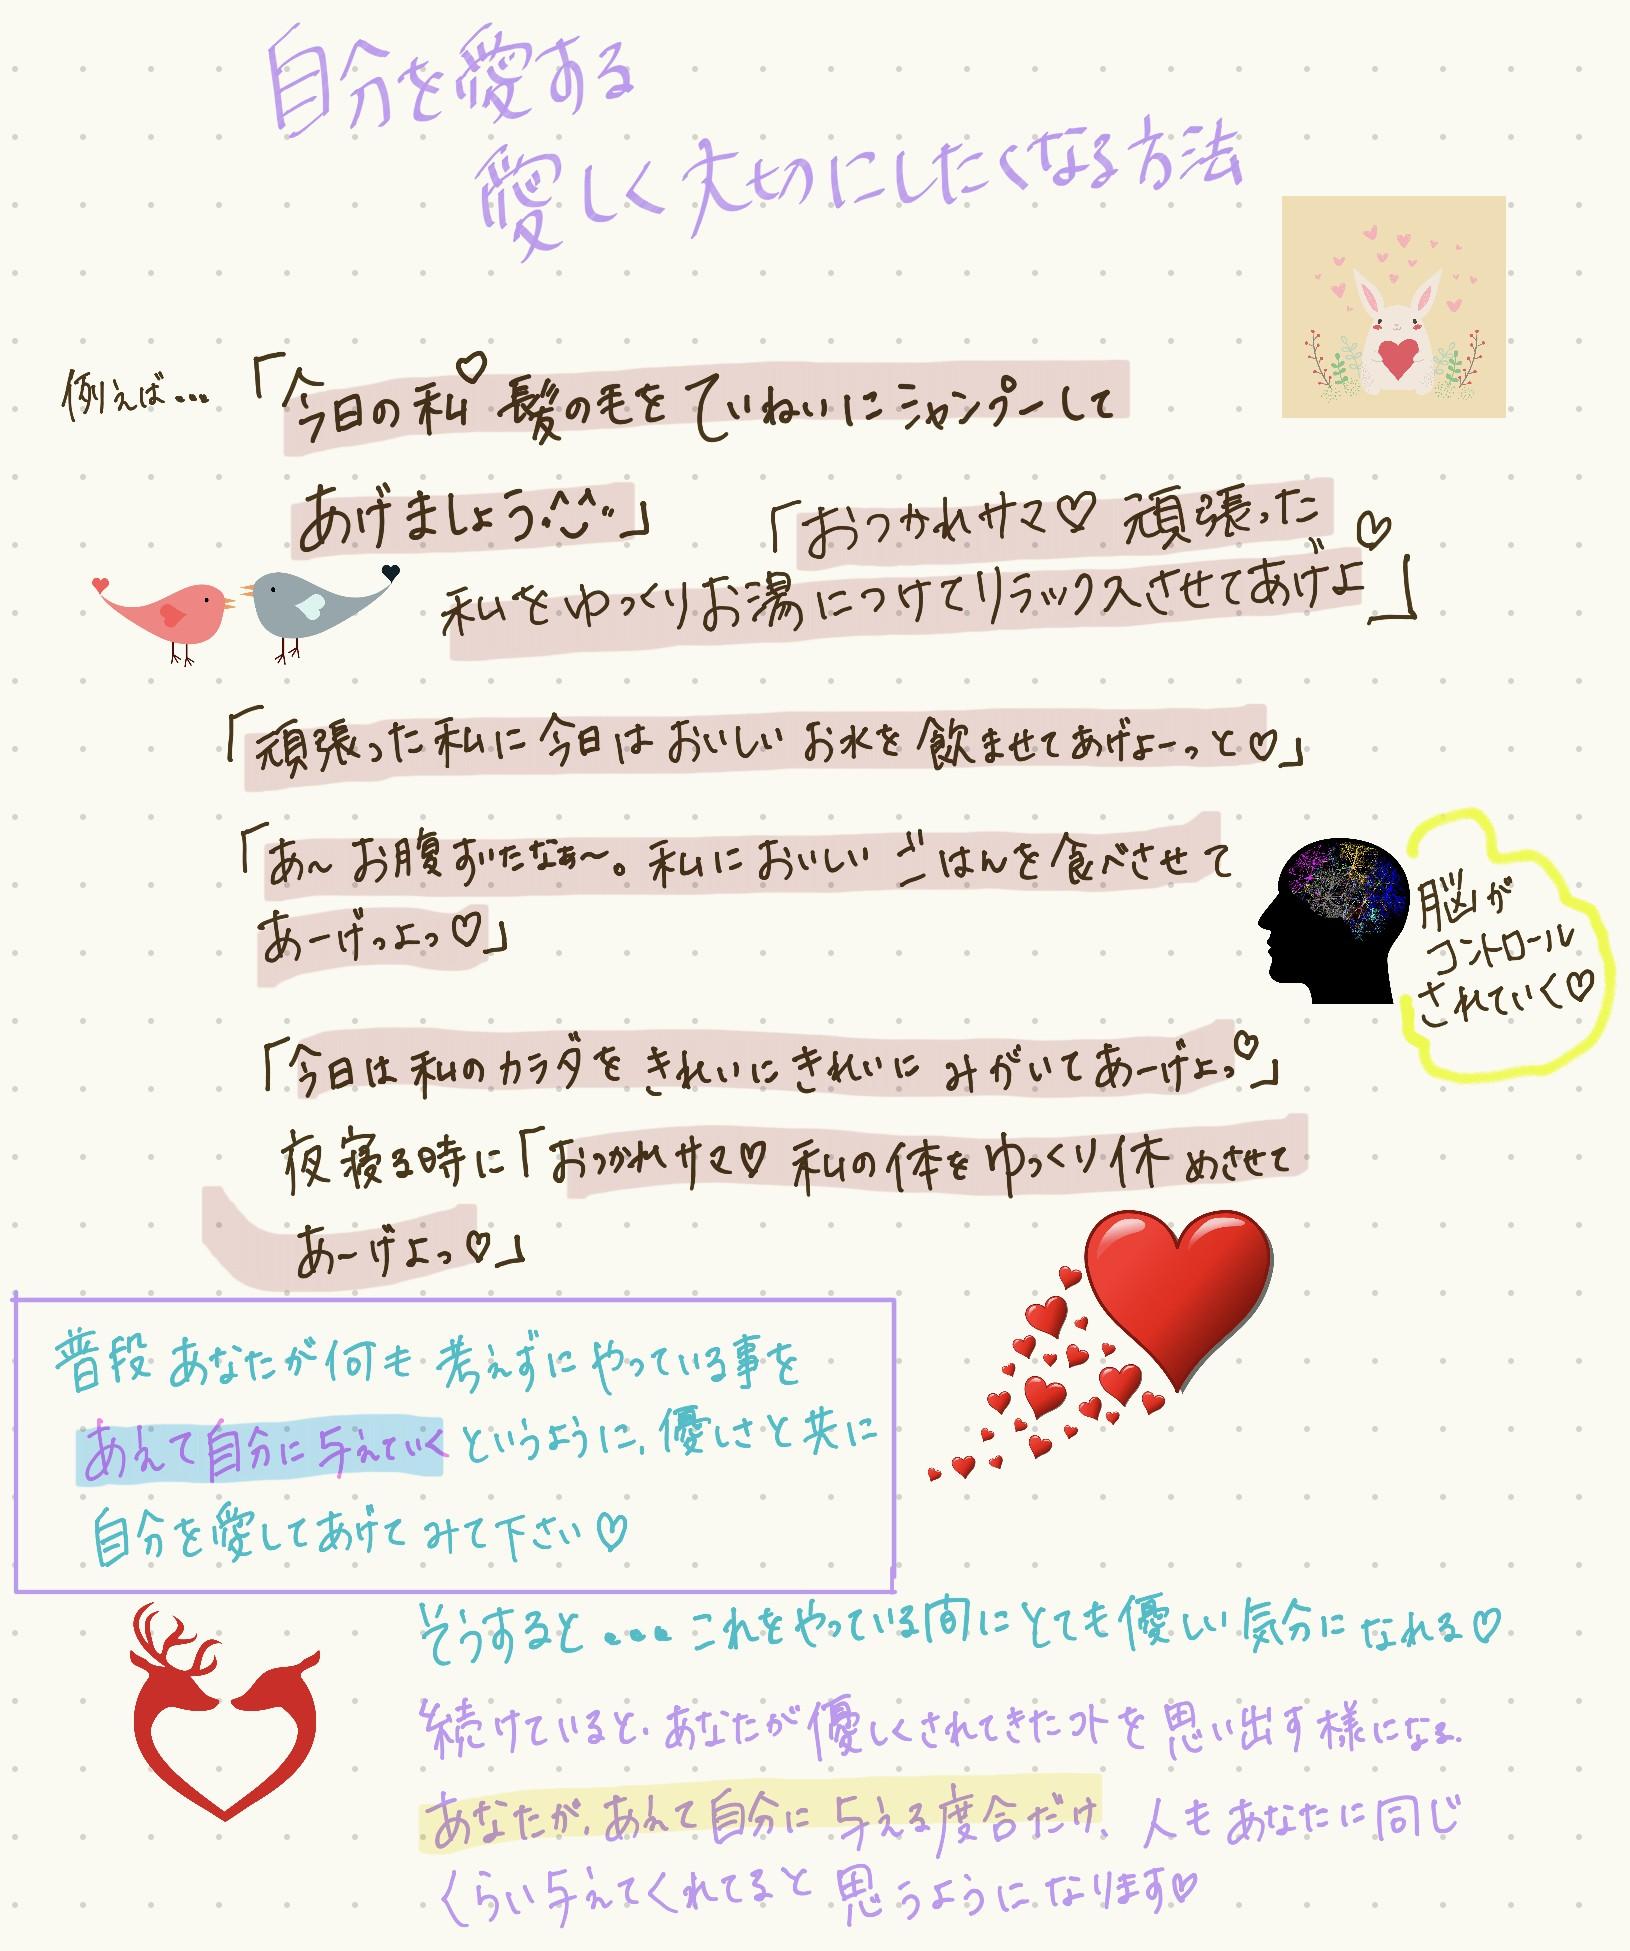 f:id:yuyu-s:20191219170108j:image